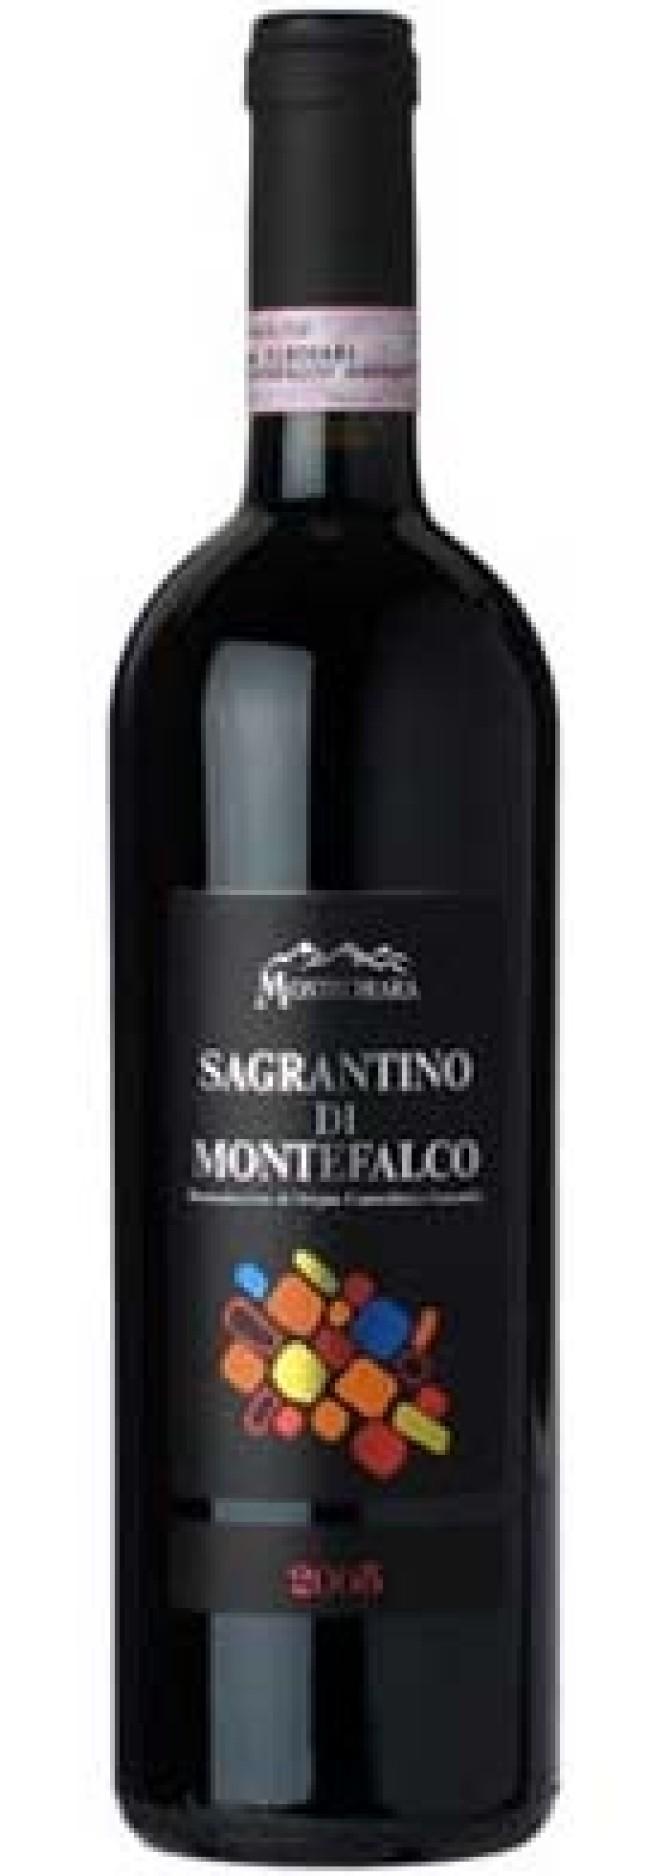 montechiara-sagrantino-di-montefalco